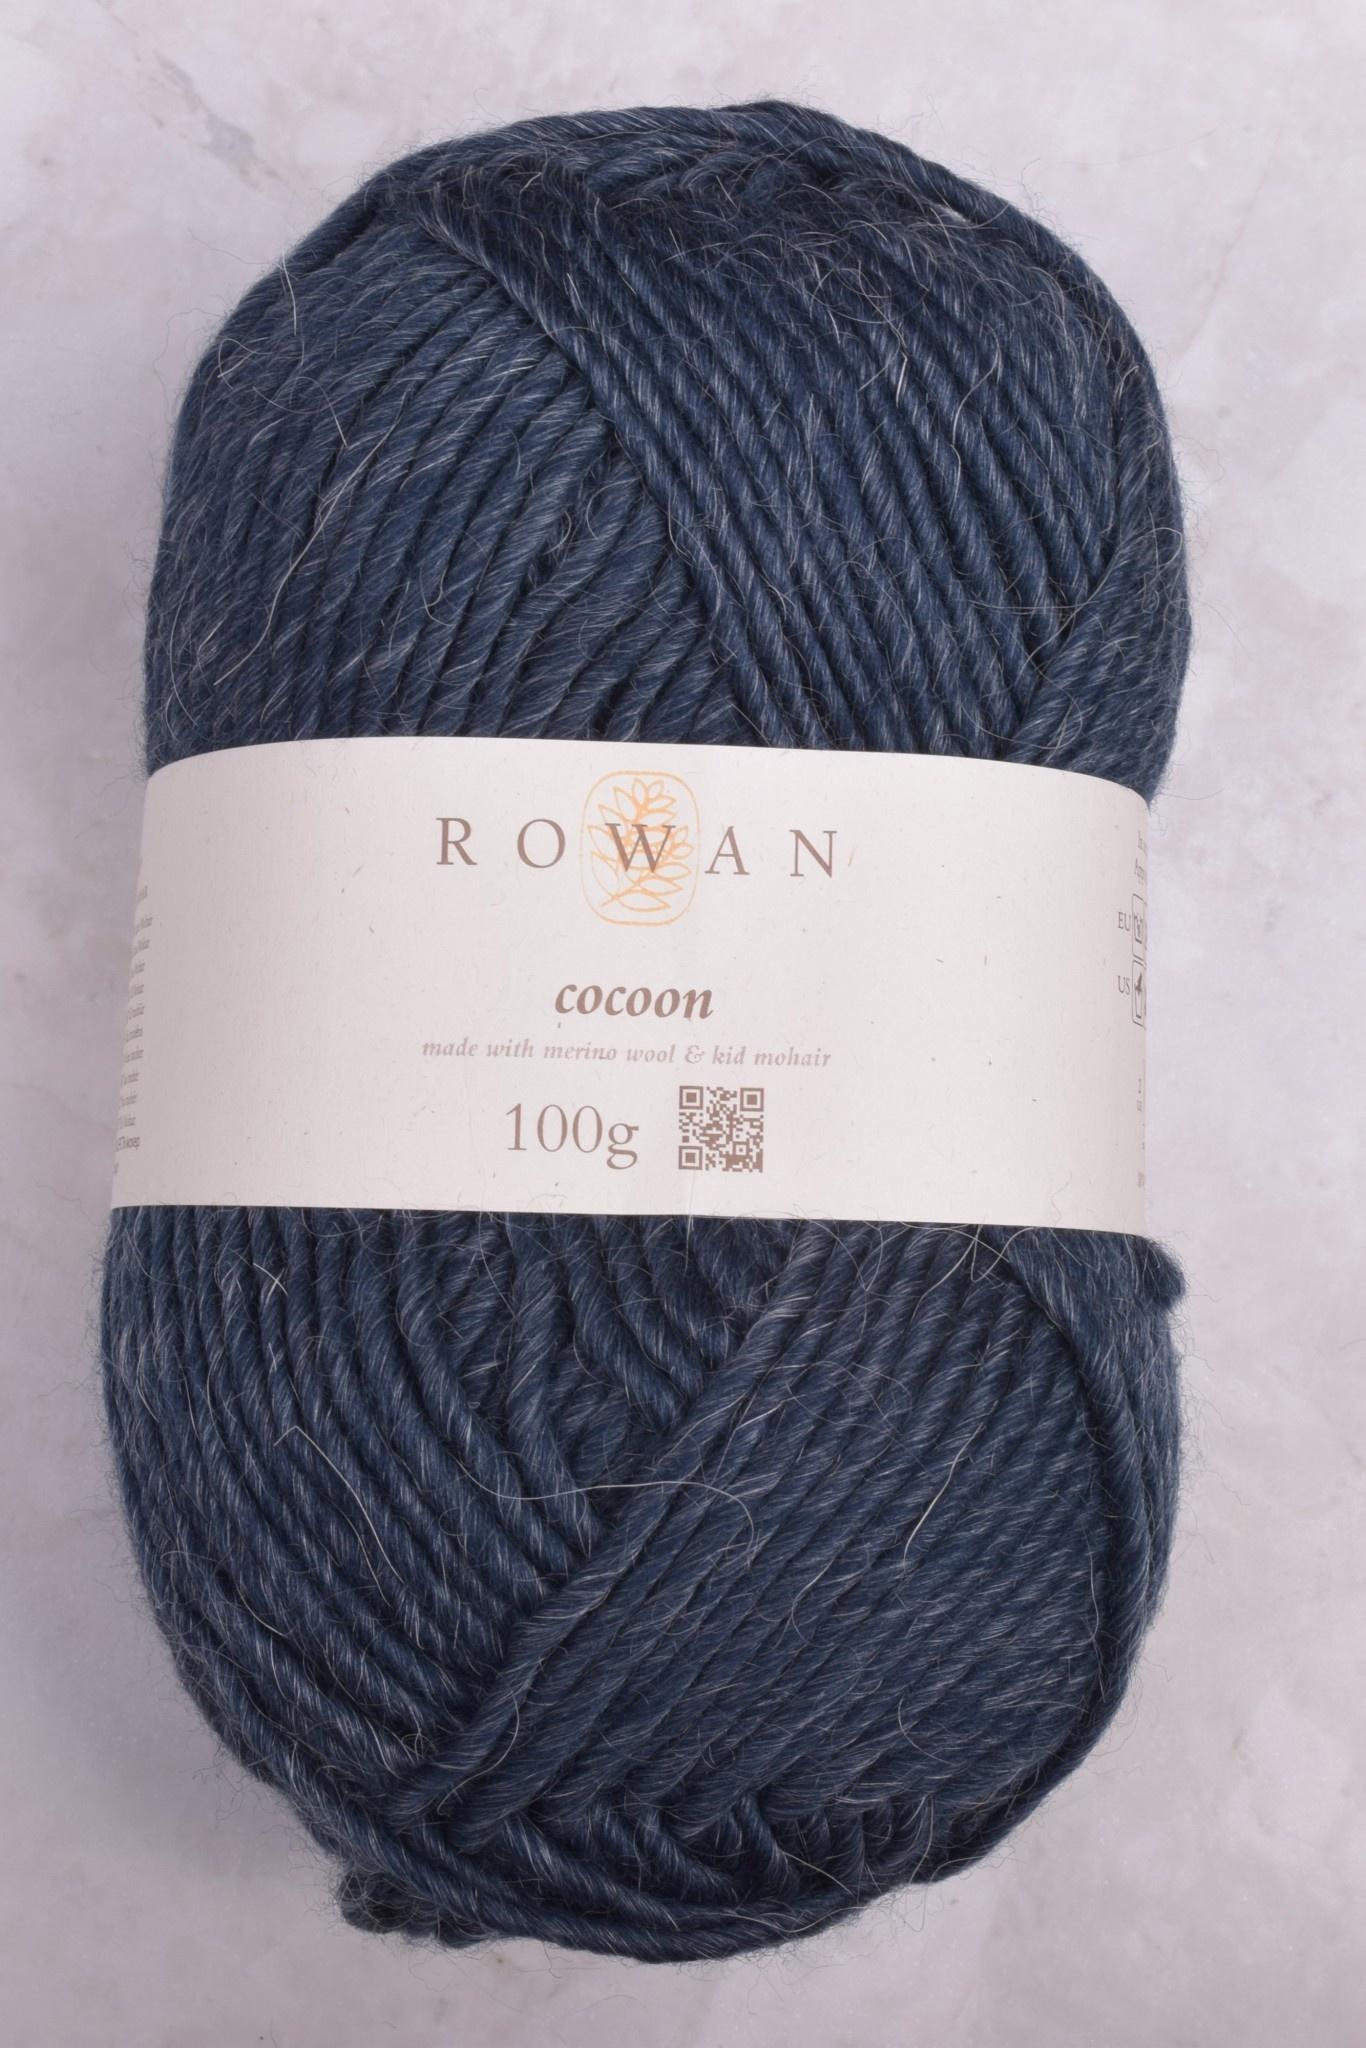 Image of Rowan Cocoon 846 Petrol (Discontinued)